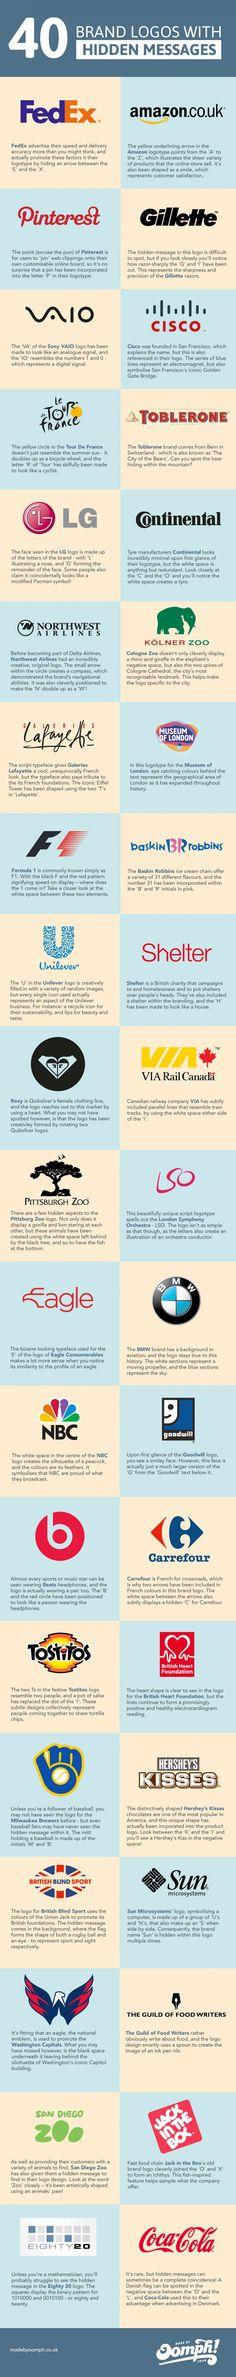 40 Brand Logos with Hidden Messages